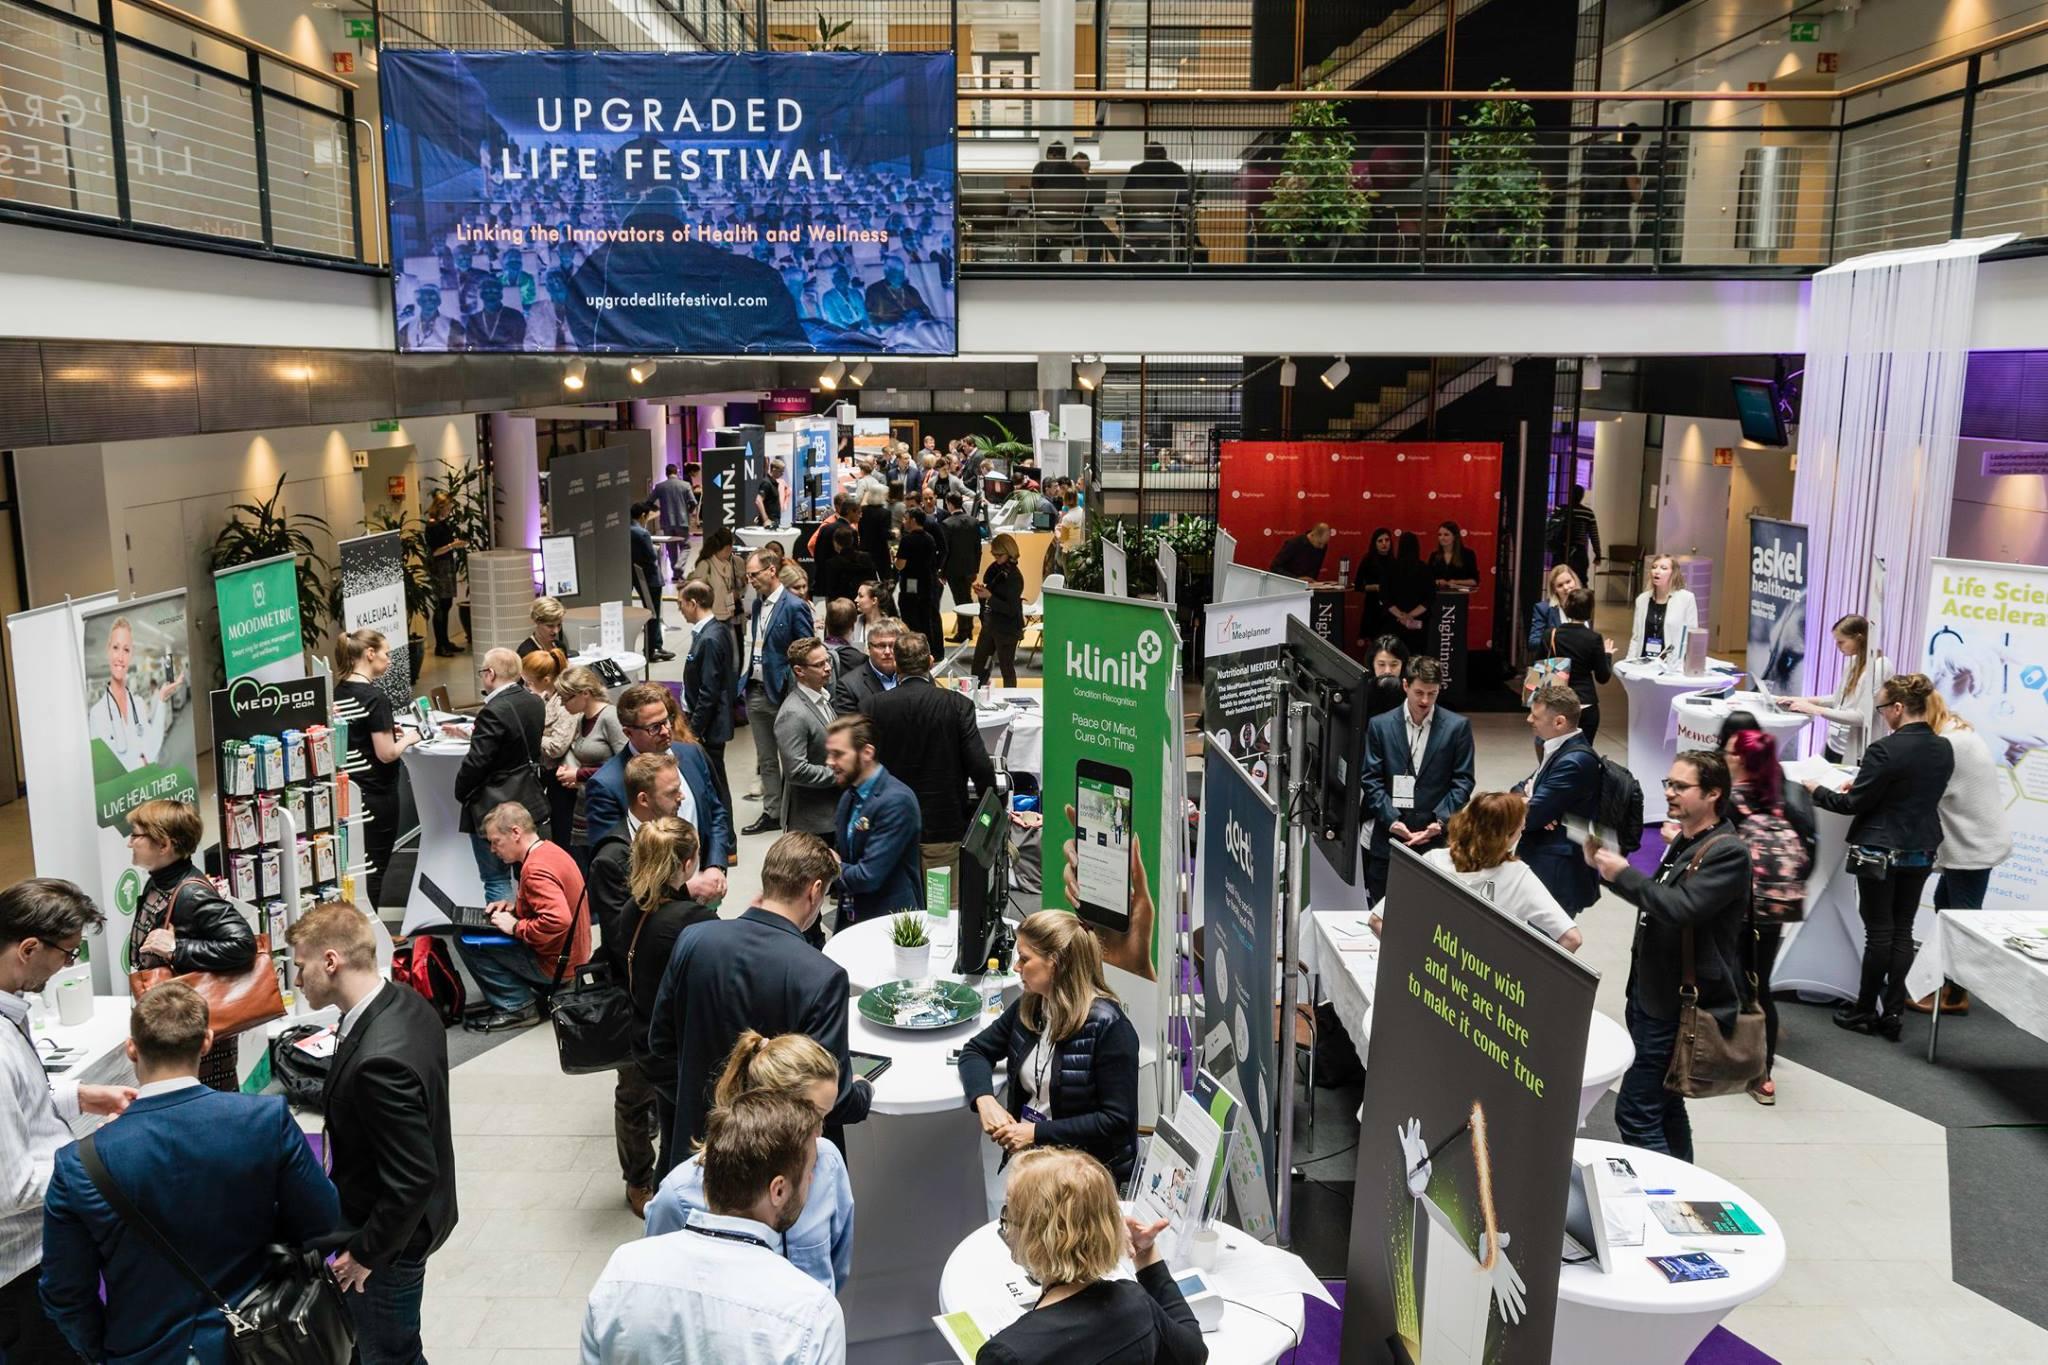 innokasmedical_fairs_events.jpg